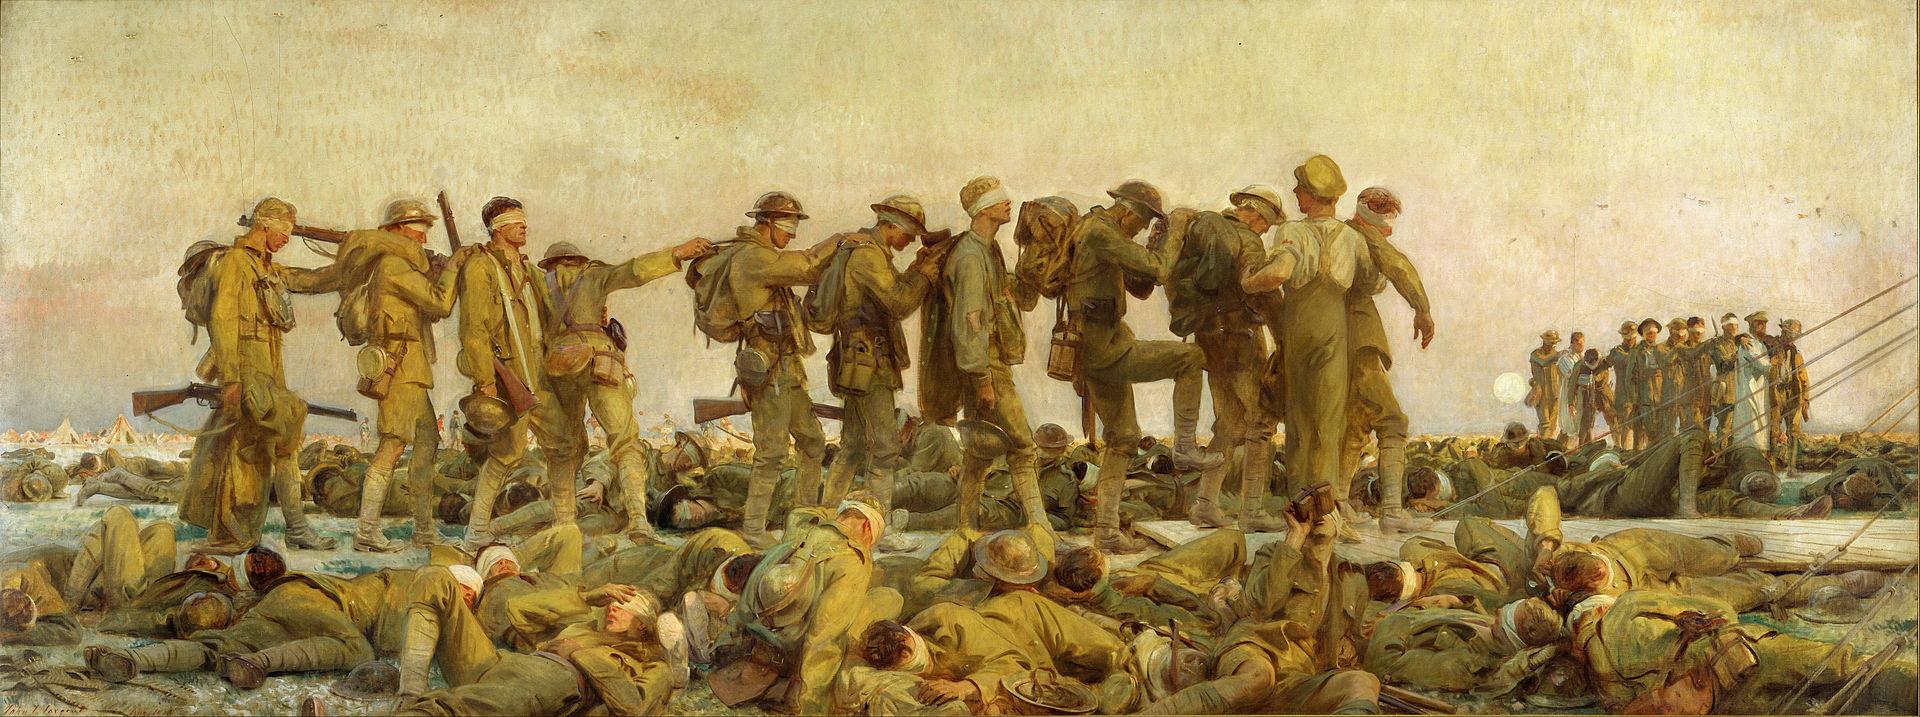 John Singer Sargent. Gassed, 1918. The Imperial War Museum, London